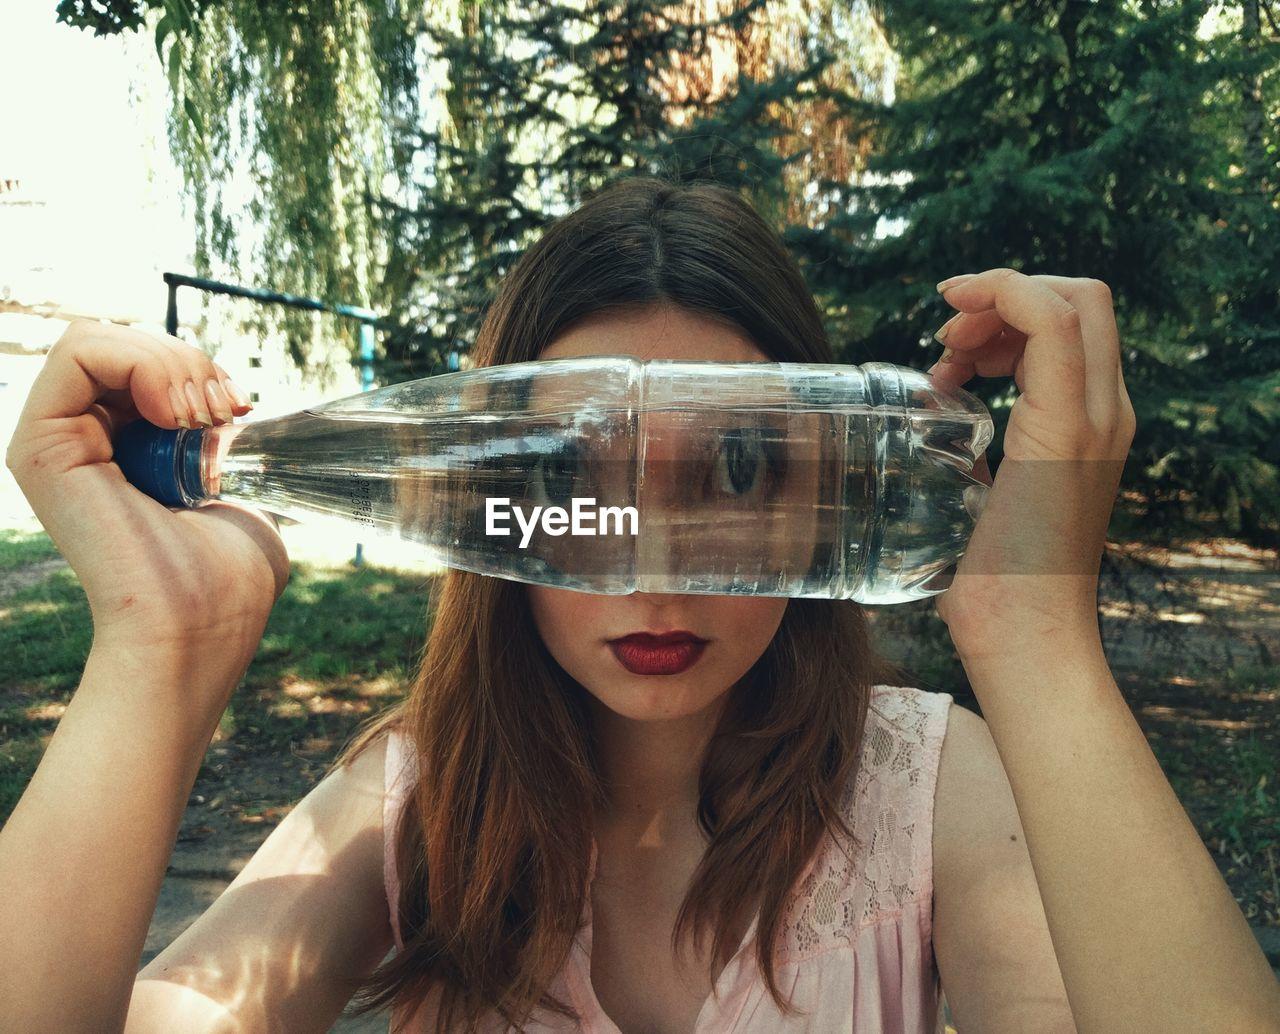 Portrait Of Woman Looking Through Water Bottle